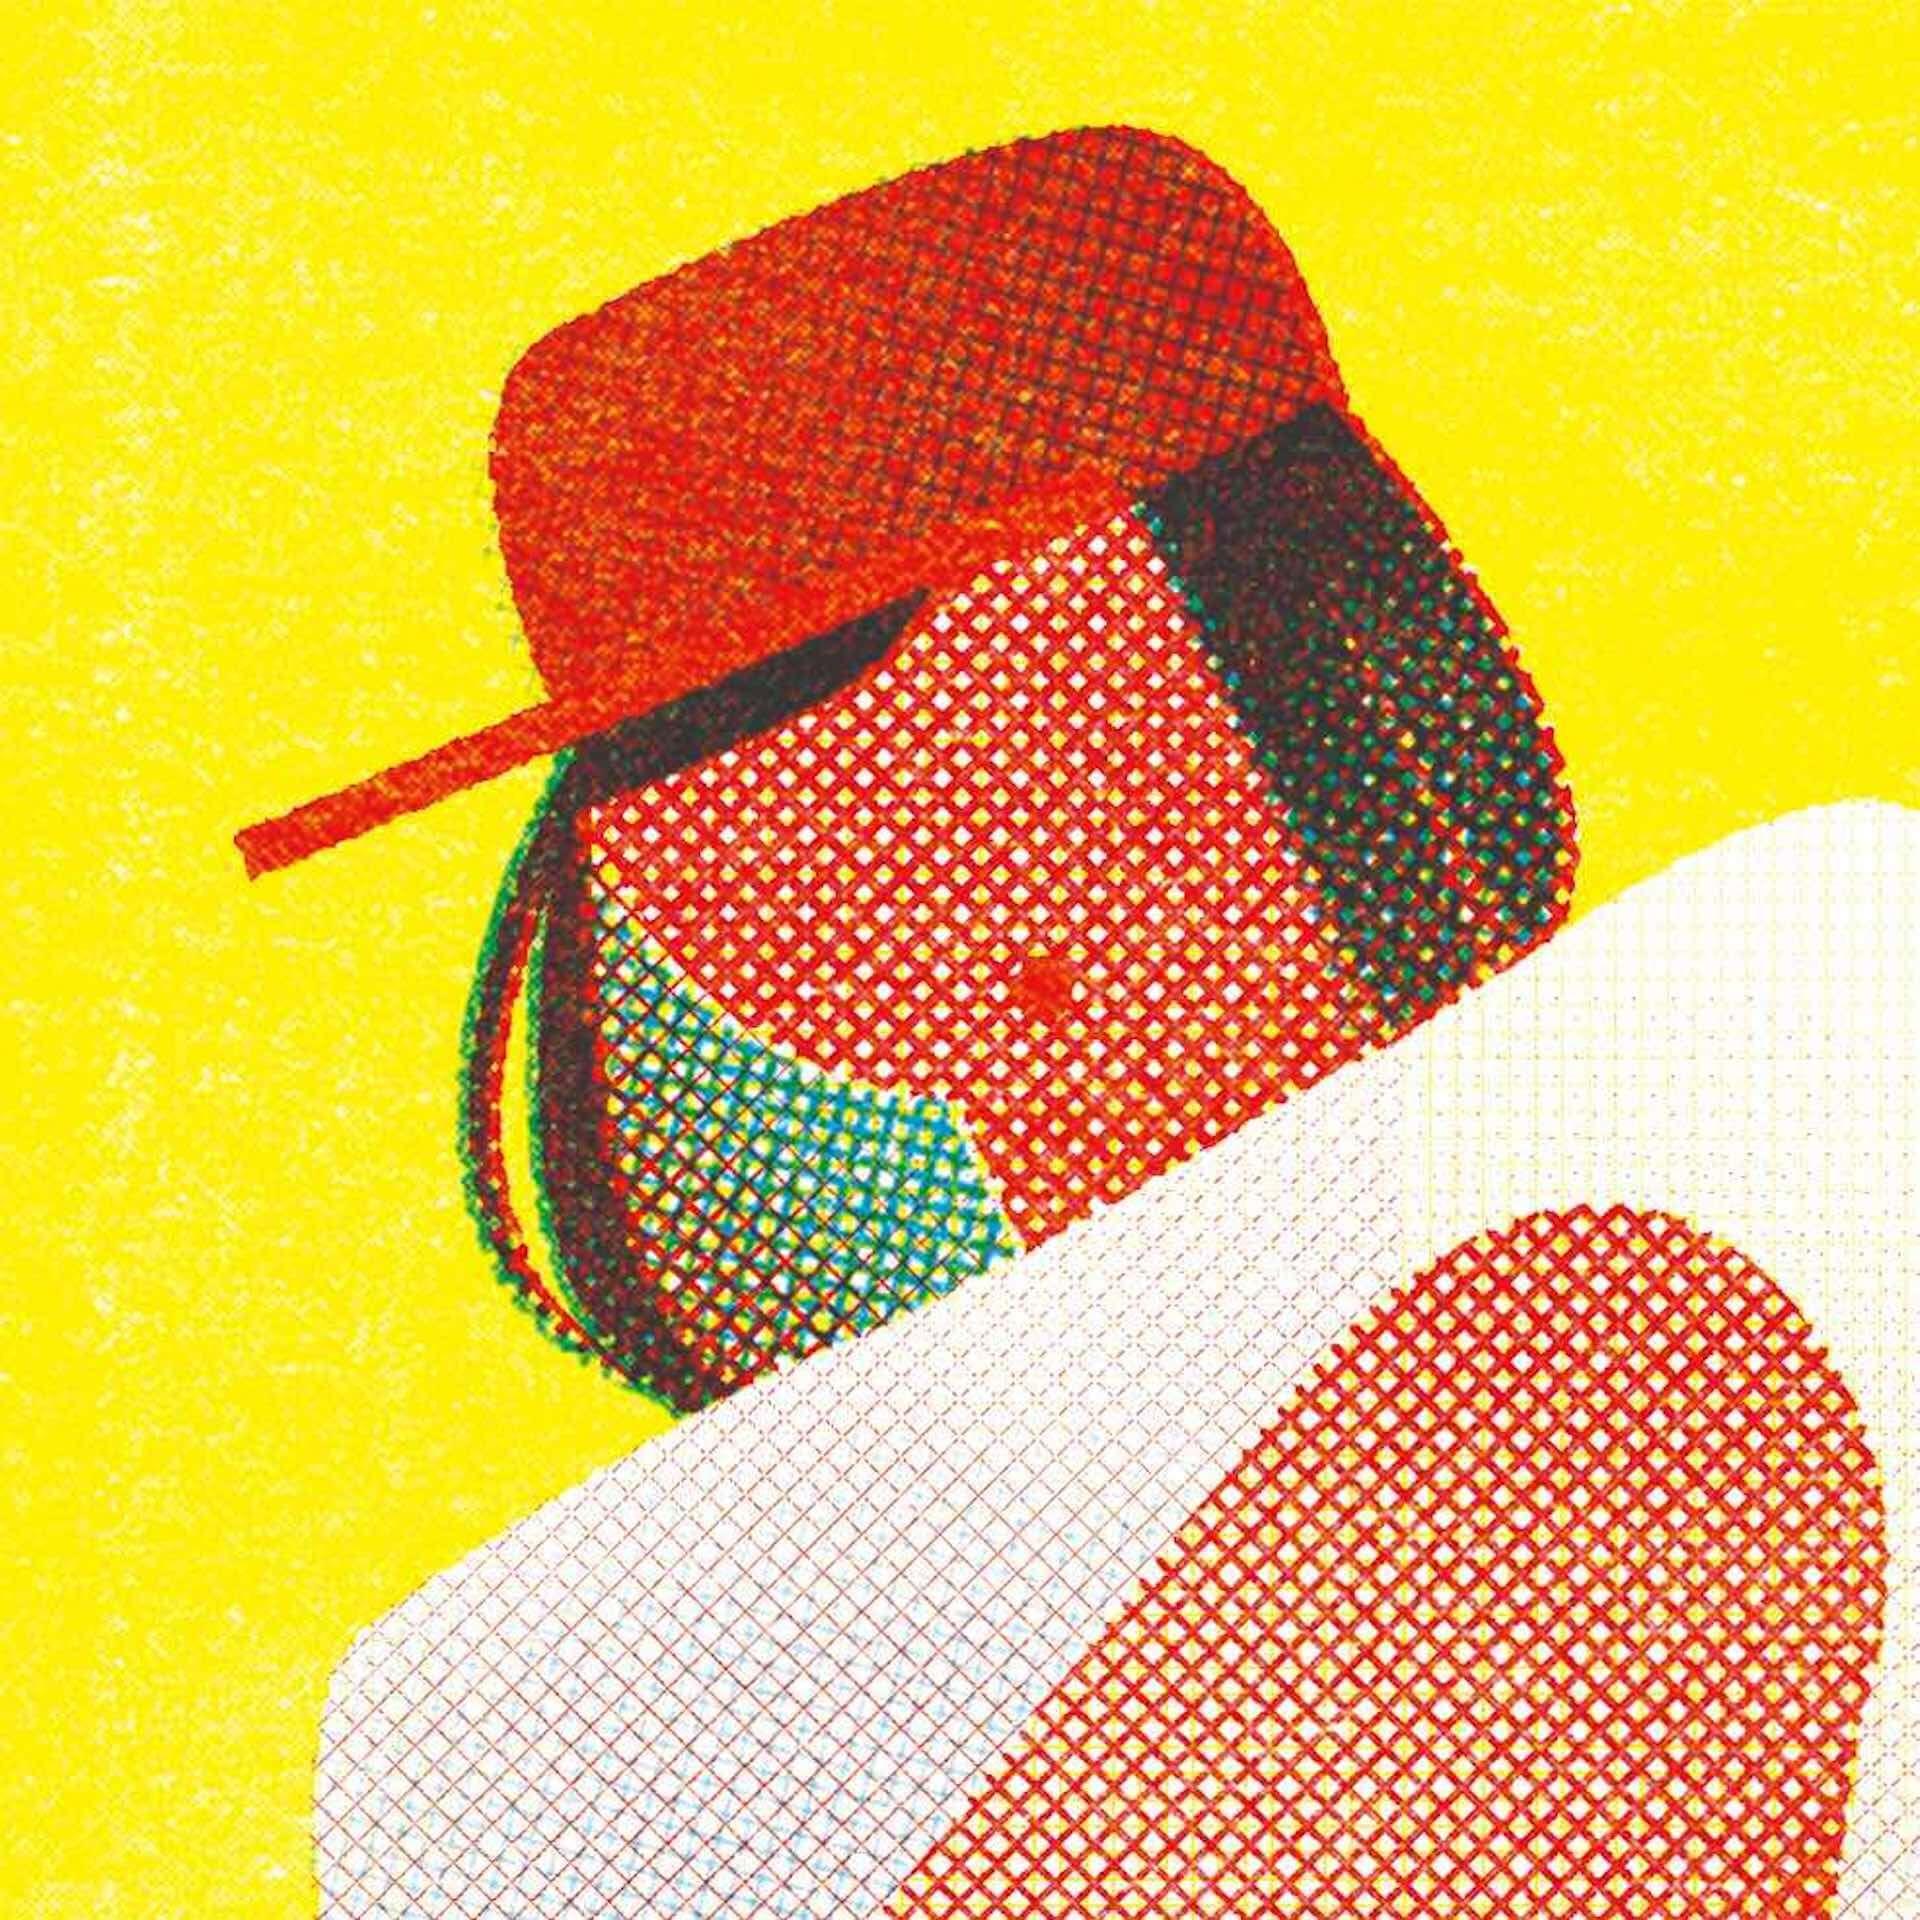 Netflix『攻殻機動隊 SAC_2045』の企画展が表参道にて開催決定!矢野恵司、Bustaskillらによる描き下ろしの新作など展示 art201215_gits-exhibition_5-1920x1920